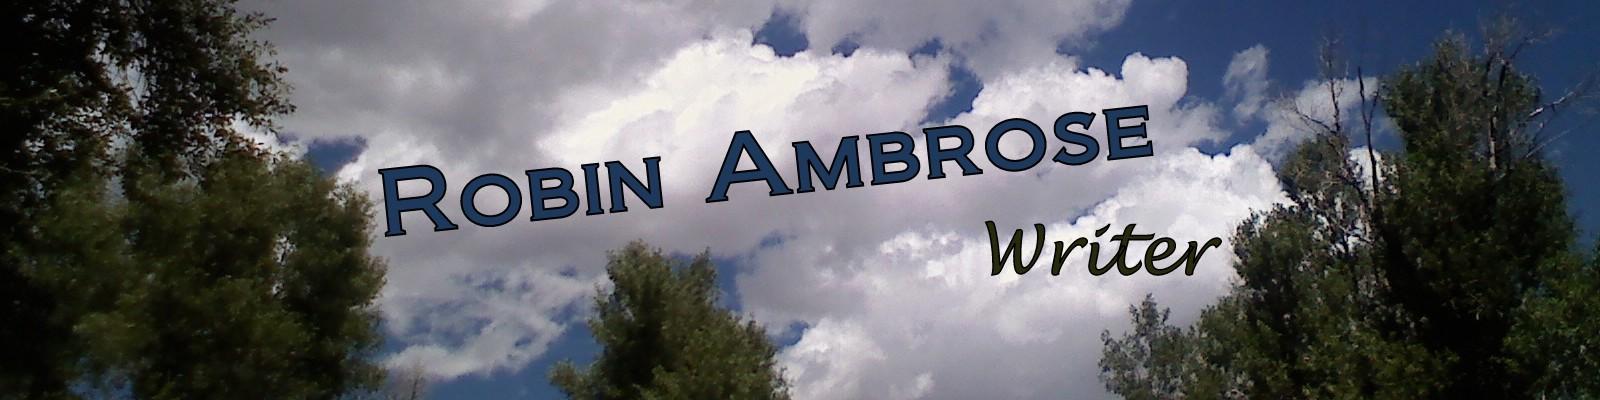 Robin Ambrose